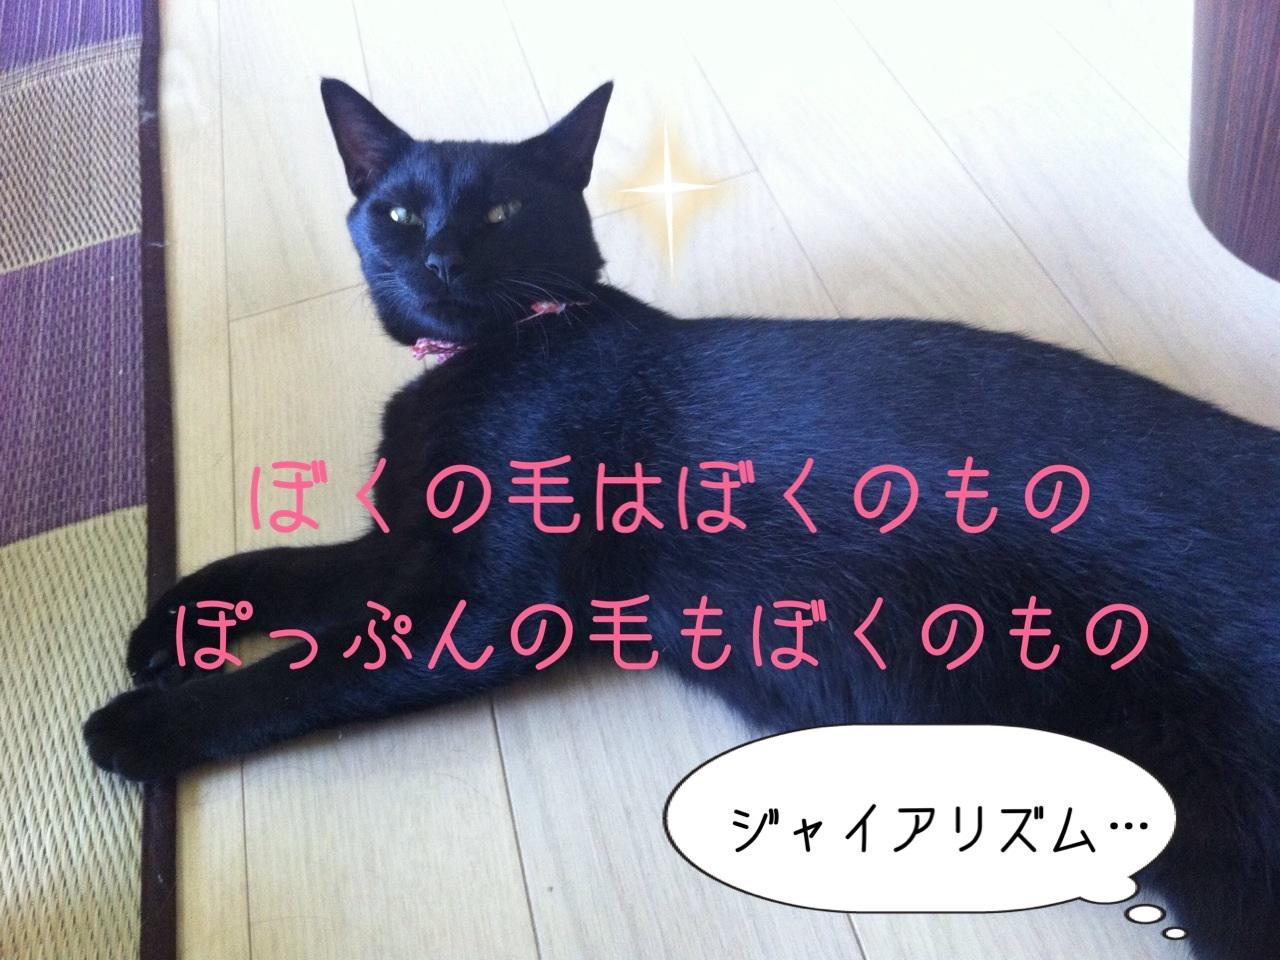 image_201308092116056c3.jpg